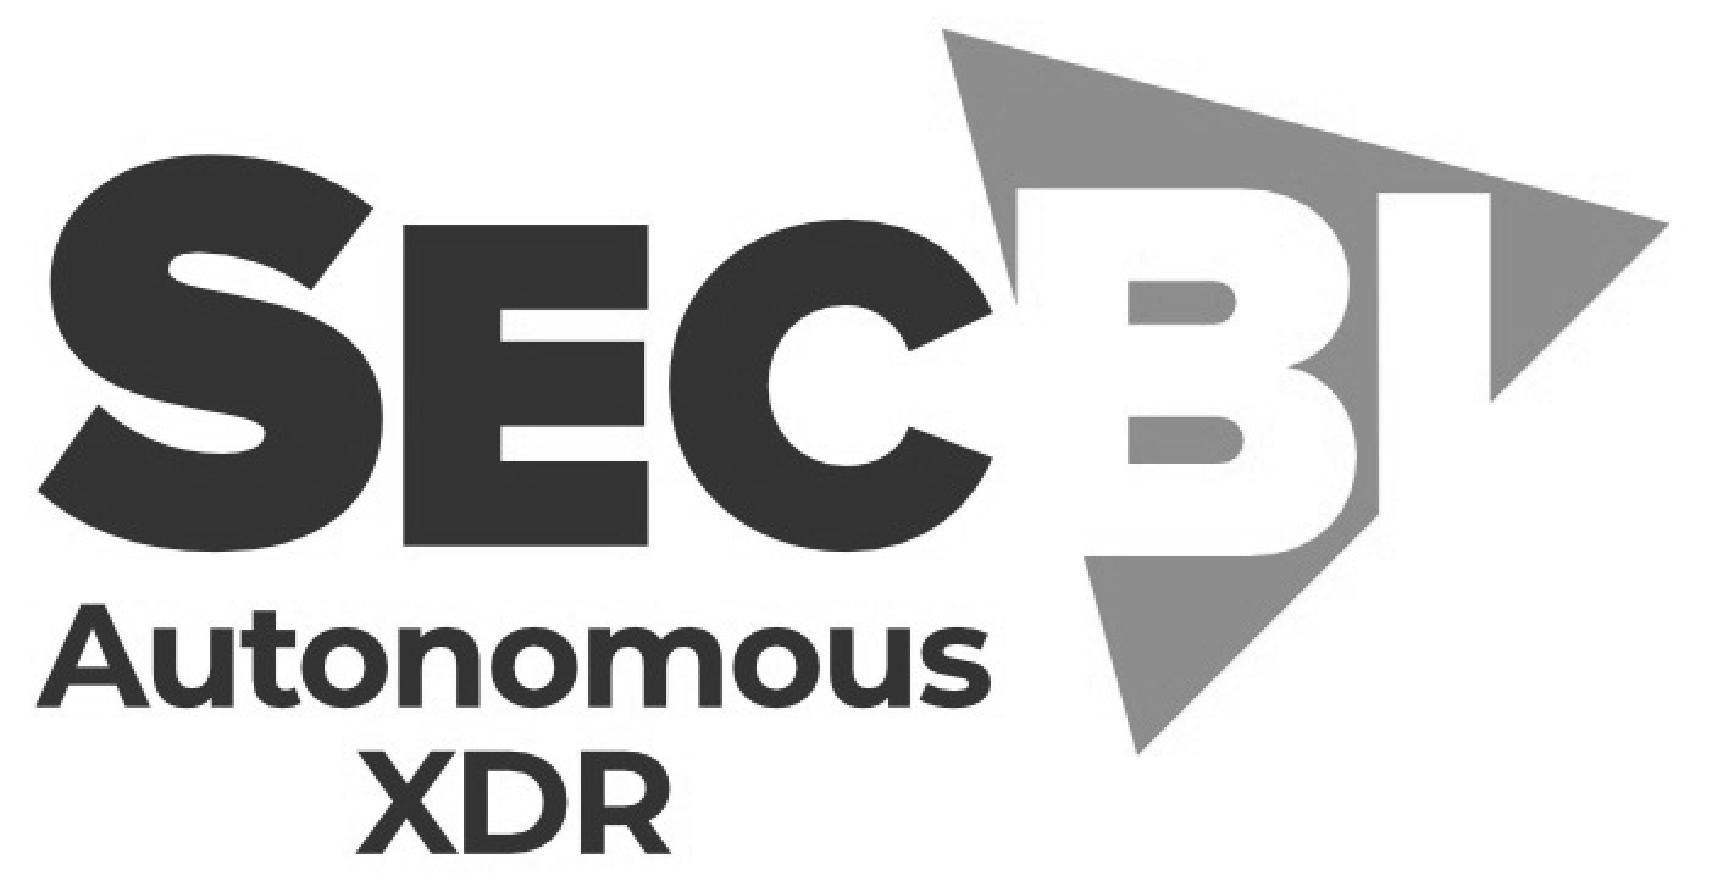 SecBI Autonomous XDRnLogo